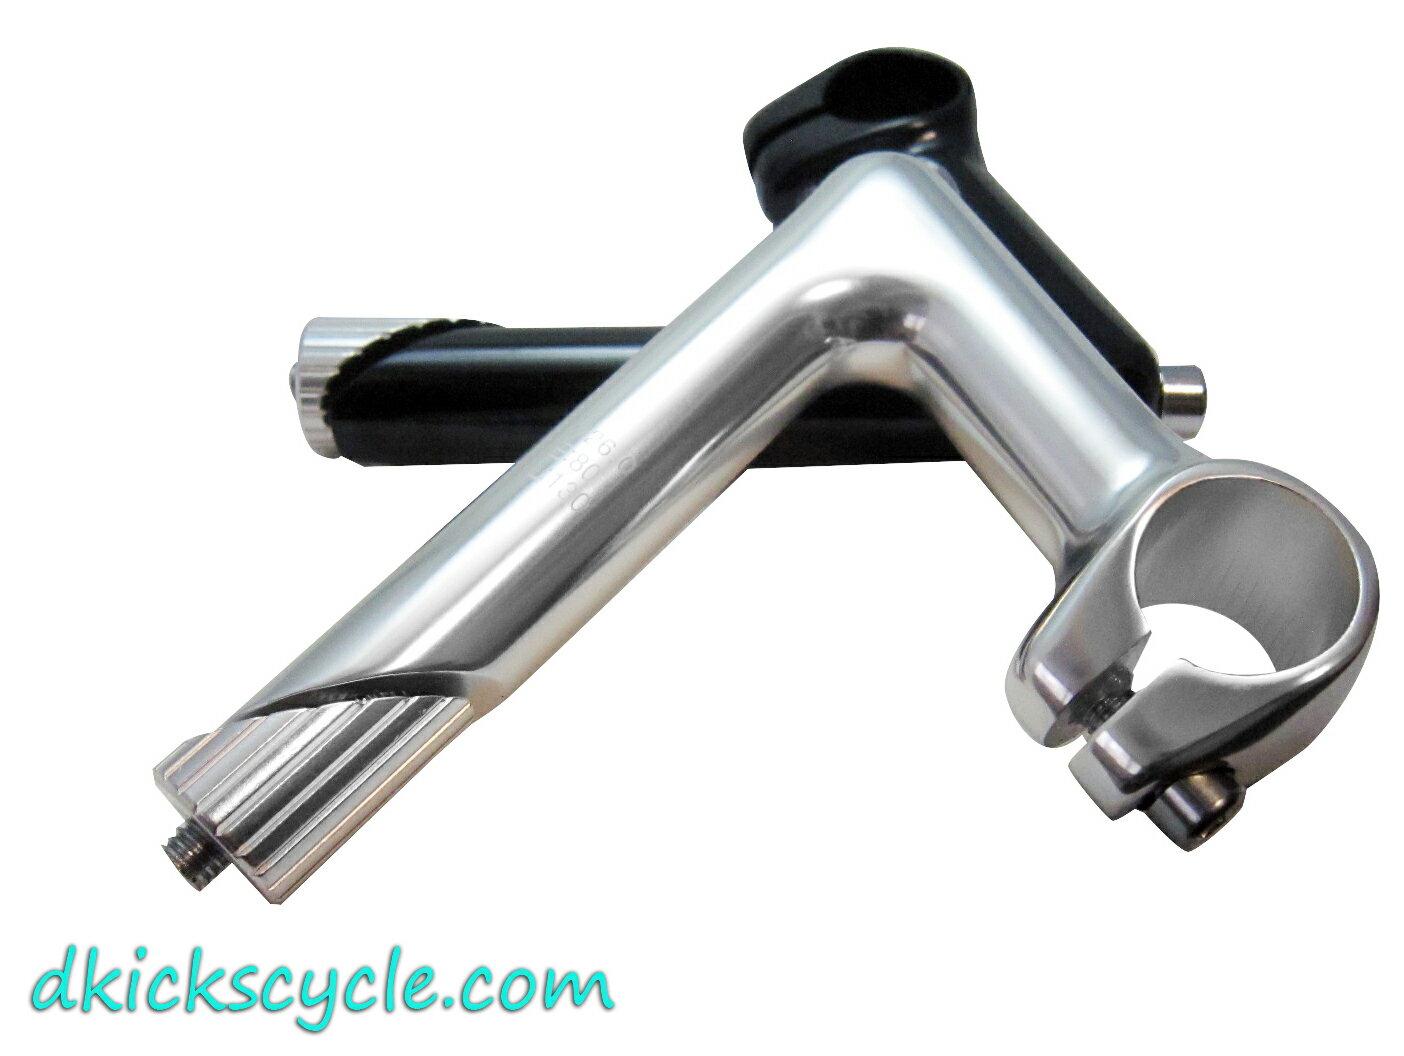 Dkicks cycle 自行車復古龍頭 26mm 少見規格 stem Fixed gear 單速車 城市車 小折